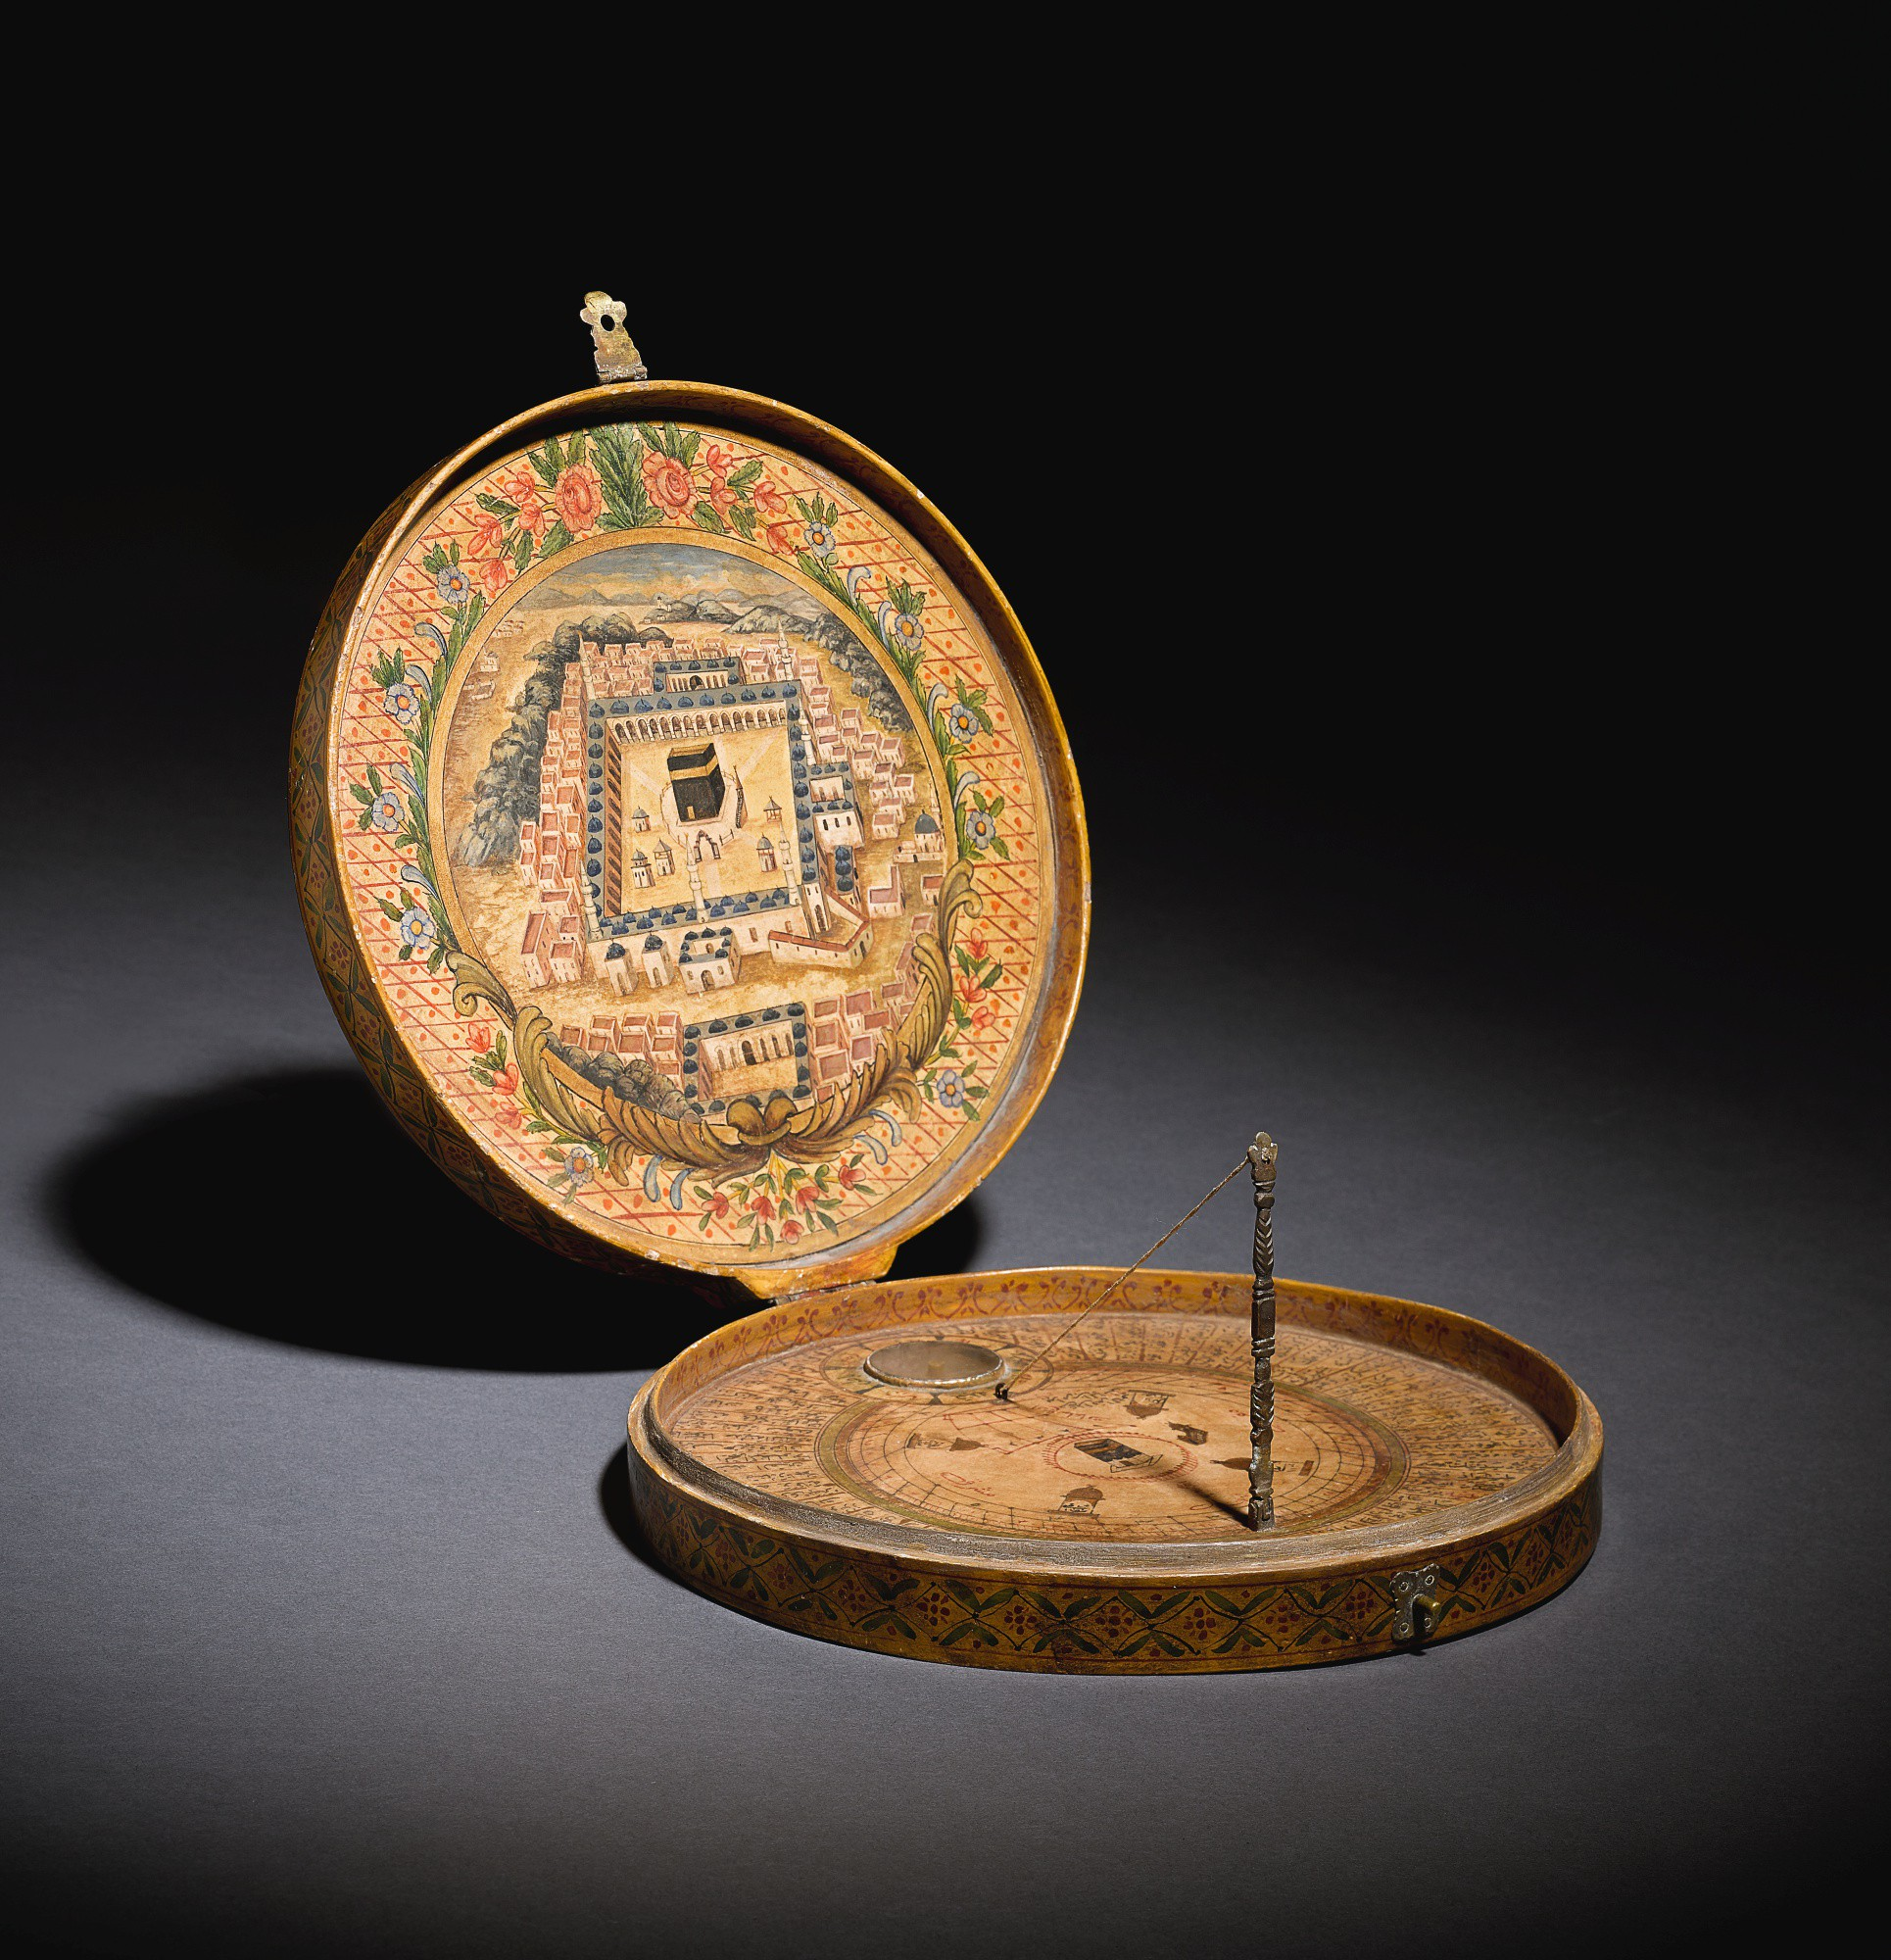 AN OTTOMAN QIBLA INDICATOR, TURKEY, 19TH CENTURY